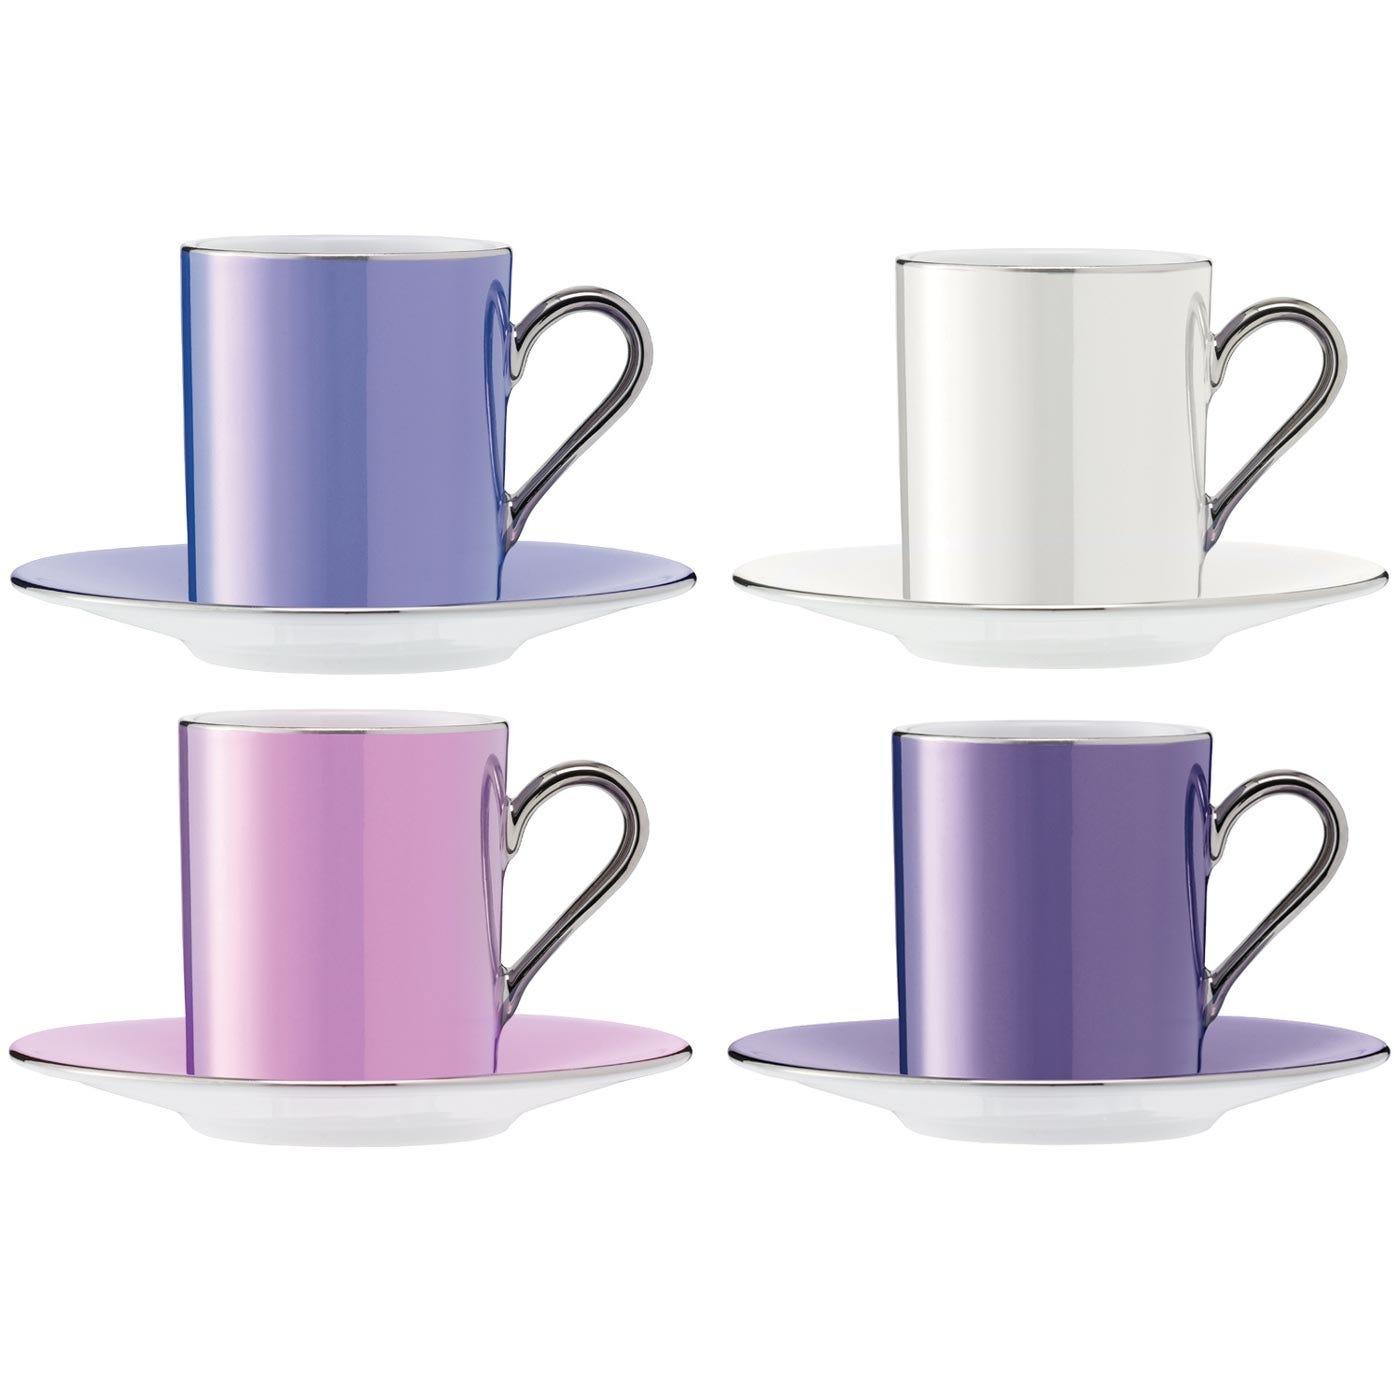 LSA International Polka Coffee Cup & Saucer Set Of 4